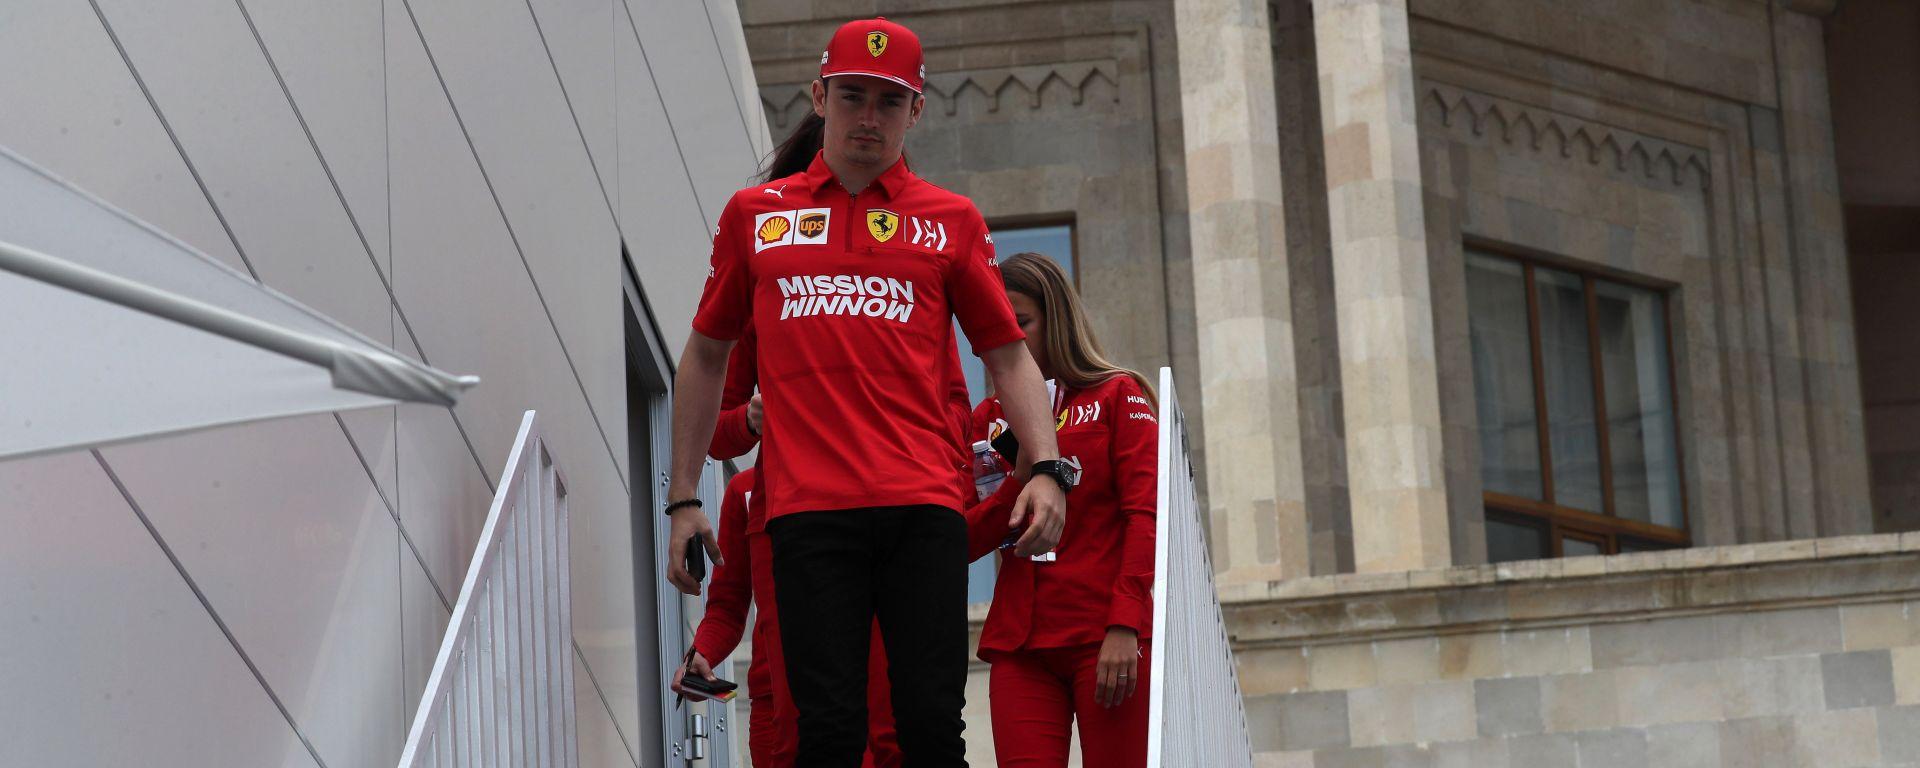 F1 GP Azerbaijan 2019, Leclerc nel giovedì di Baku